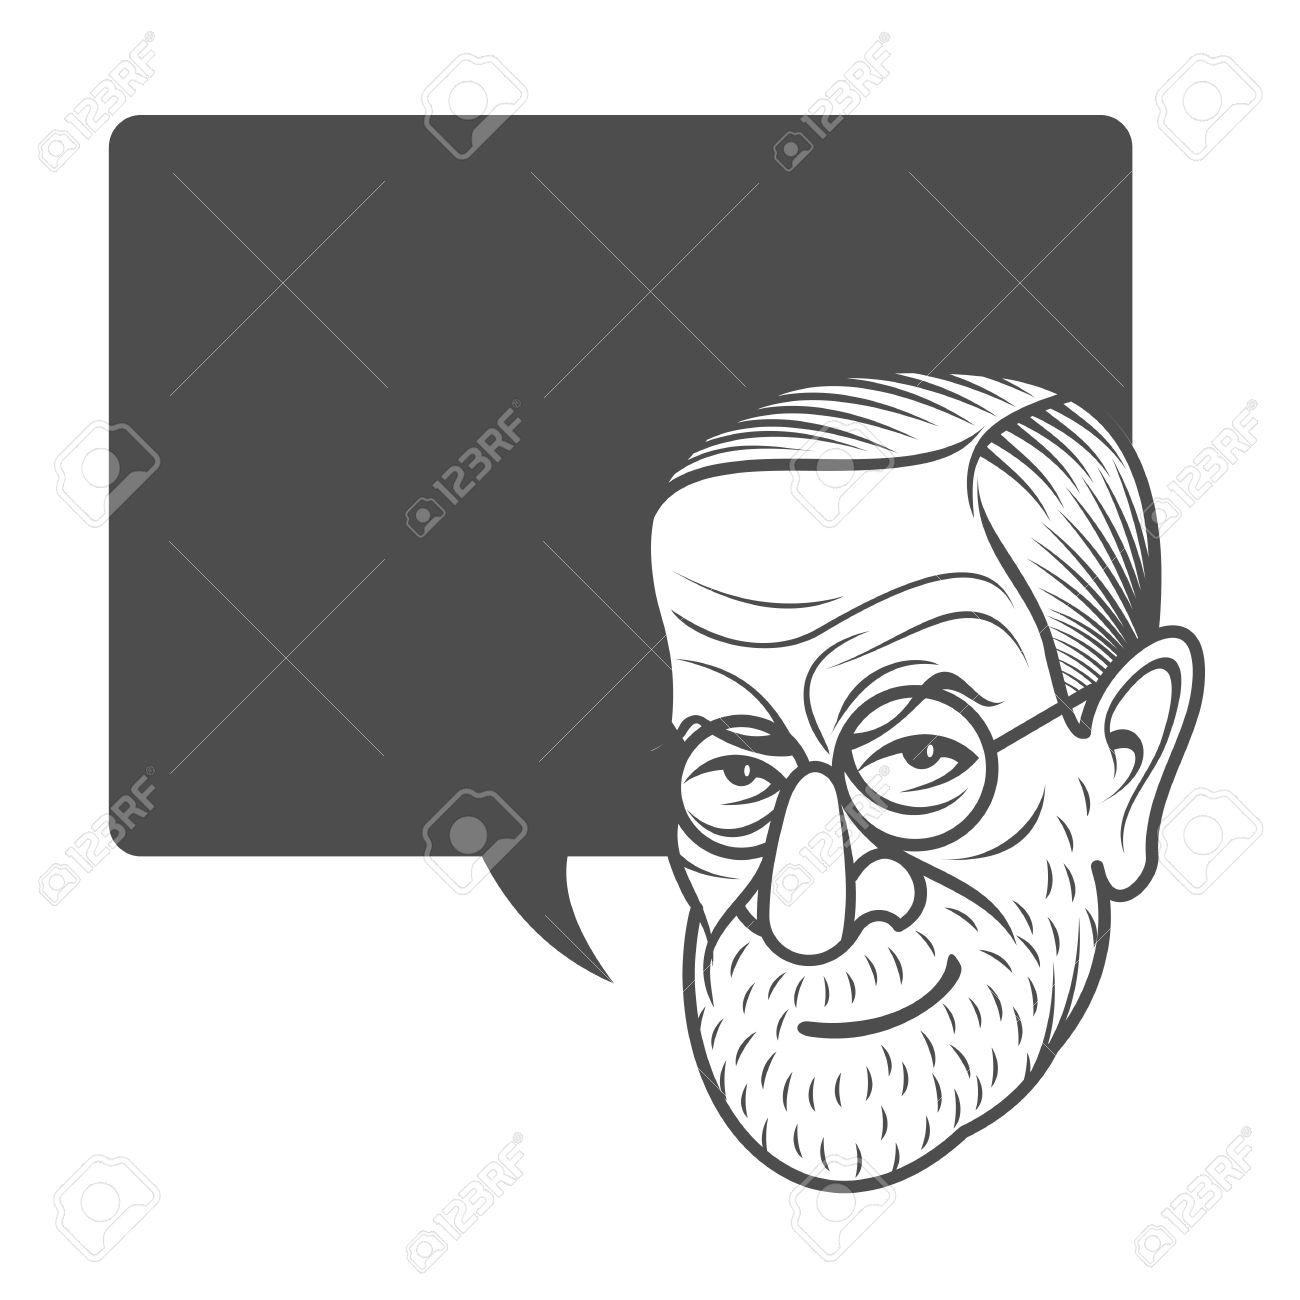 Vector Cartoon Caricature Portrait Of Sigmund Freud Vector 1300x1300